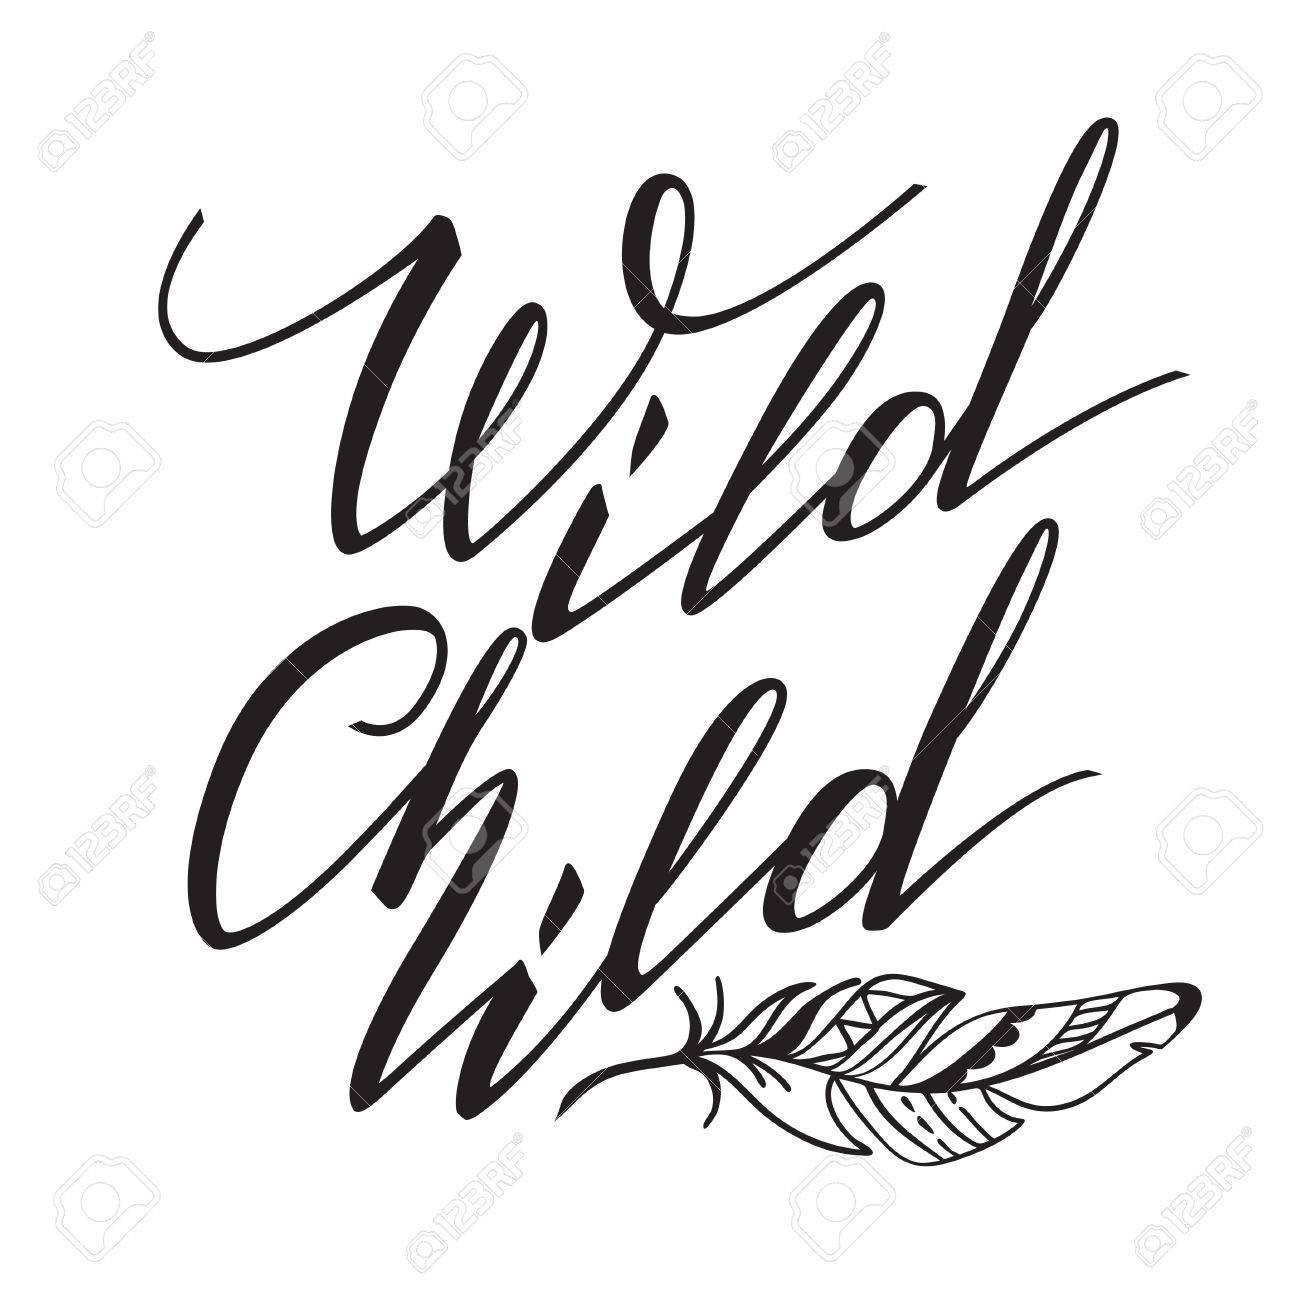 Handwritten Lettering. Inspirational Quote Wild Child. Vector...